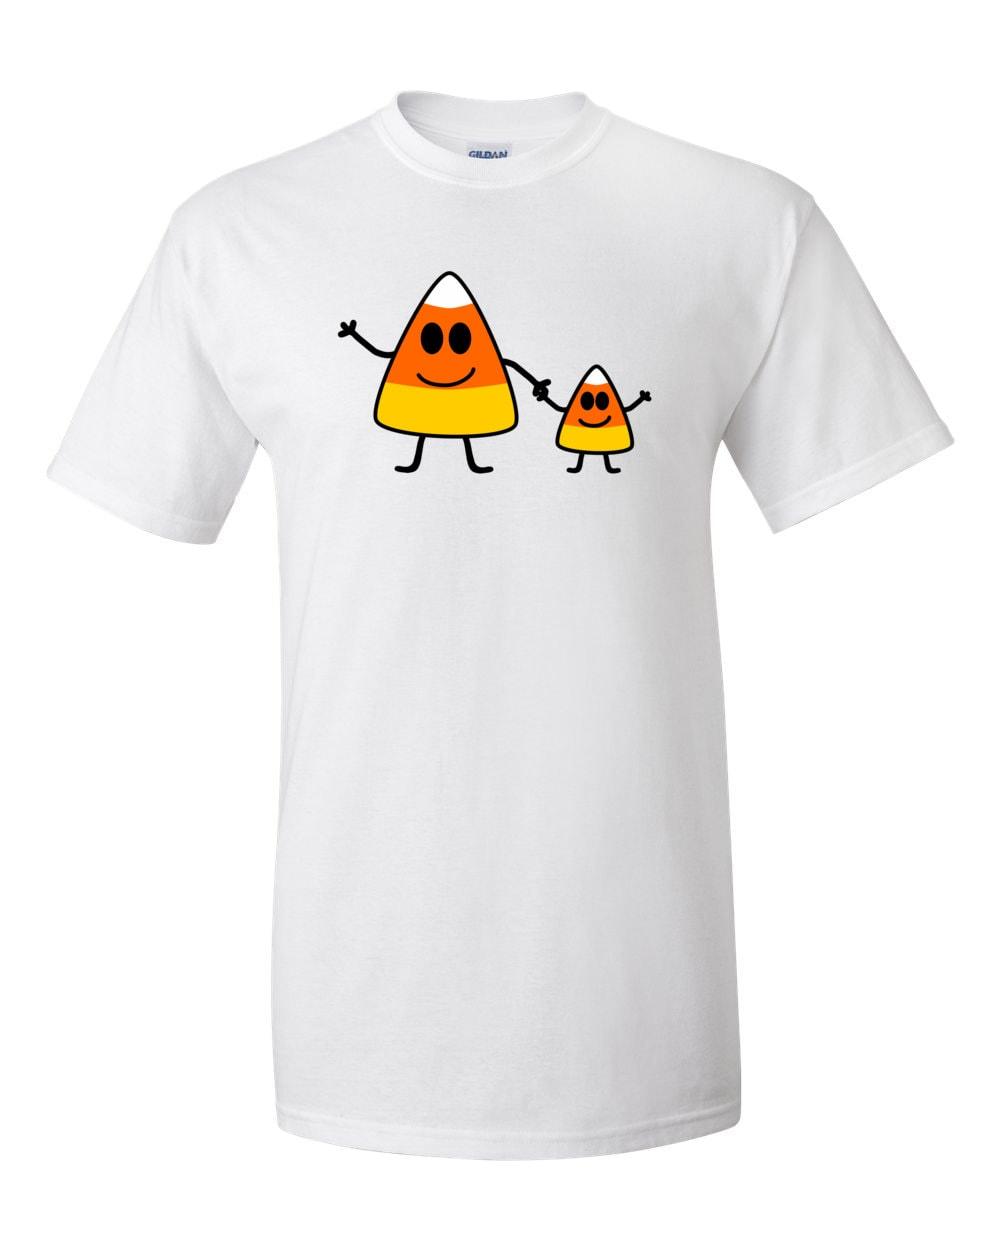 Cute Candy Corn Family Halloween T-shirt